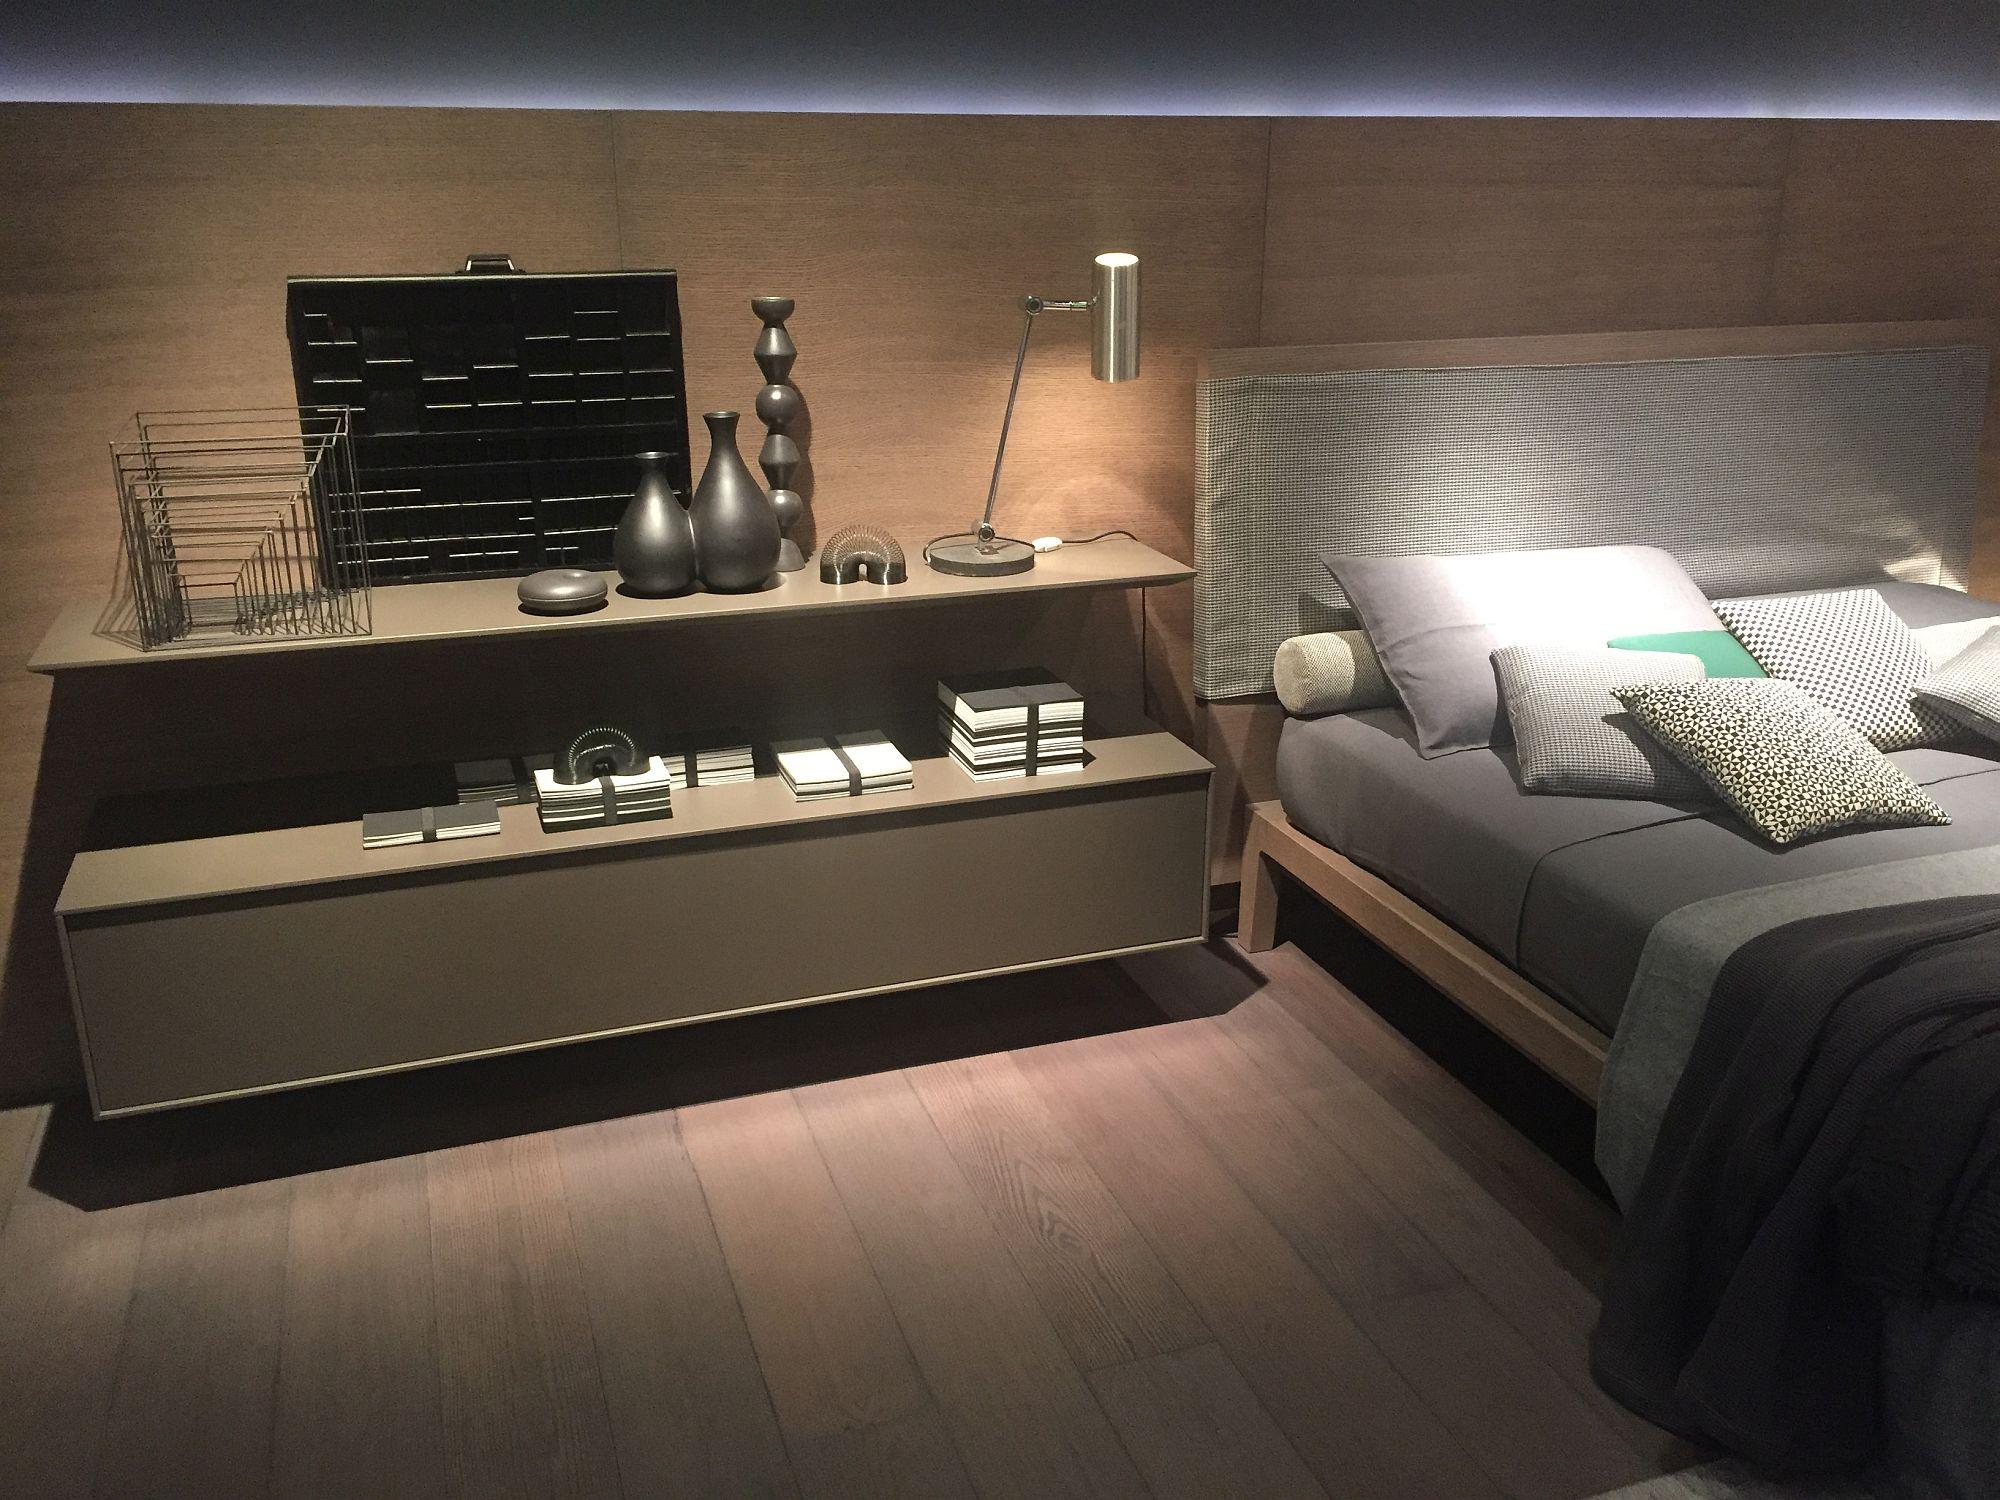 16 Innovative Bedroom Storage And Walk In Closet Ideas